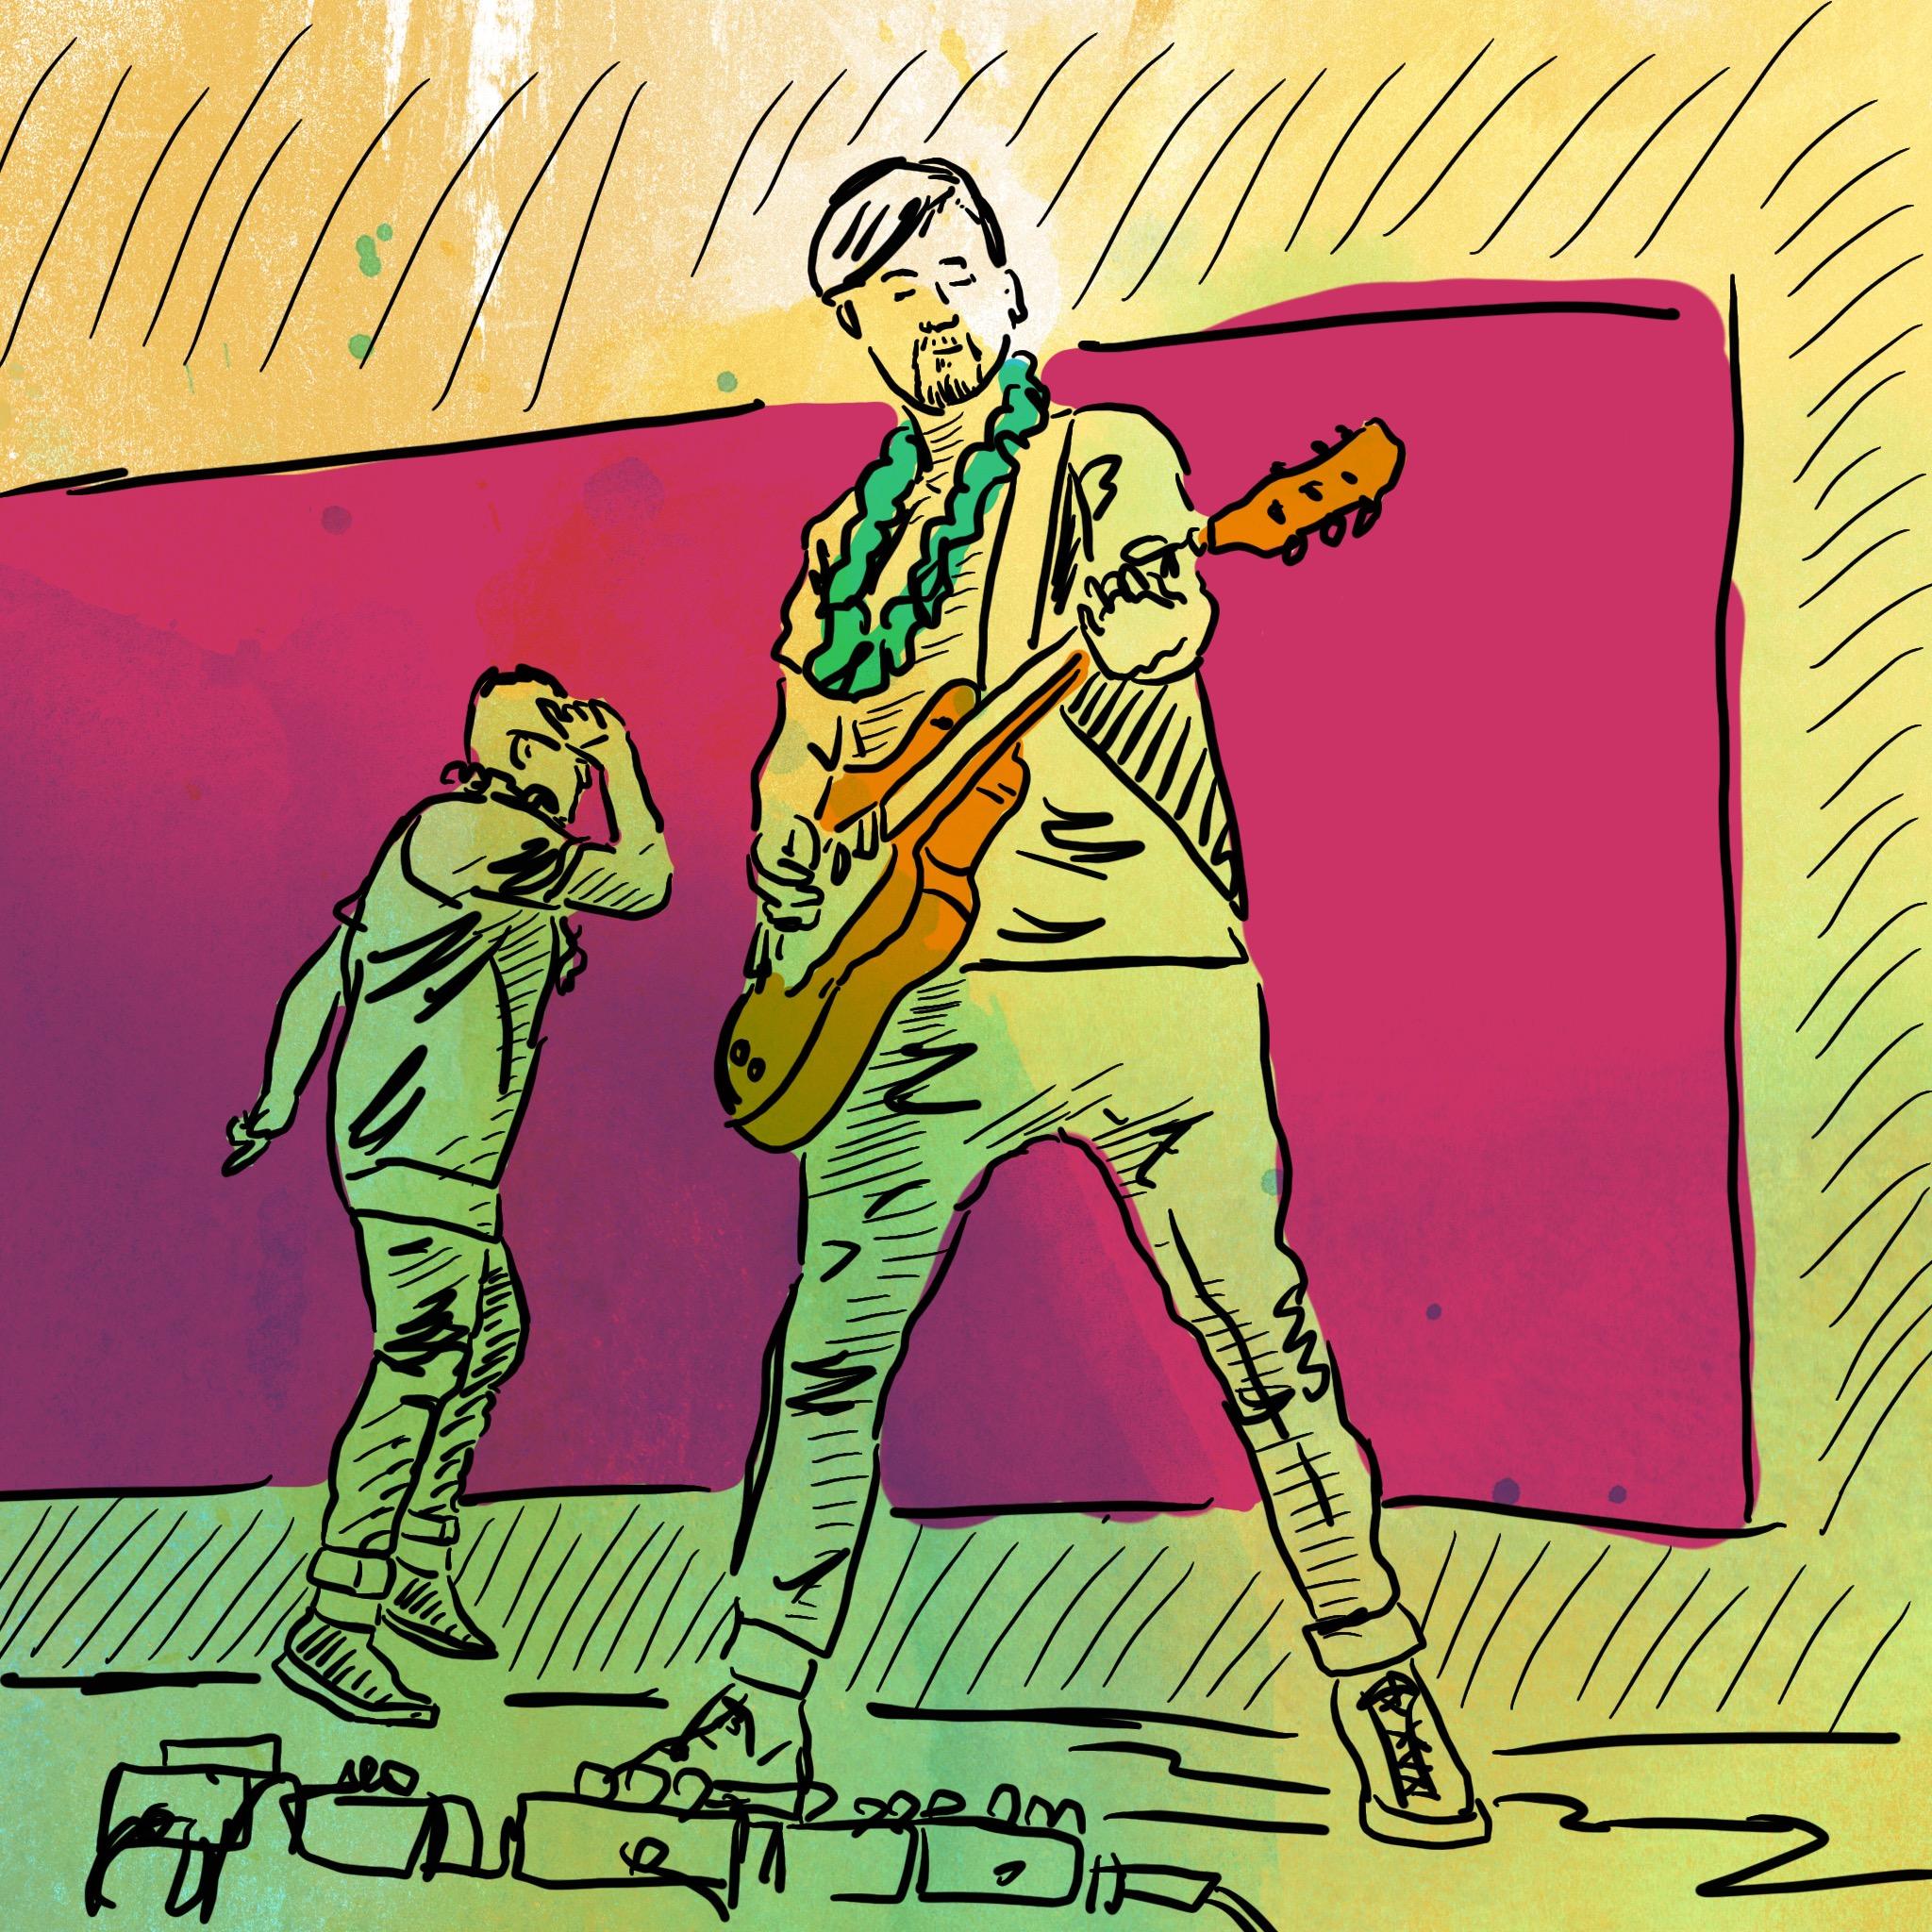 Liquid Band on Stage